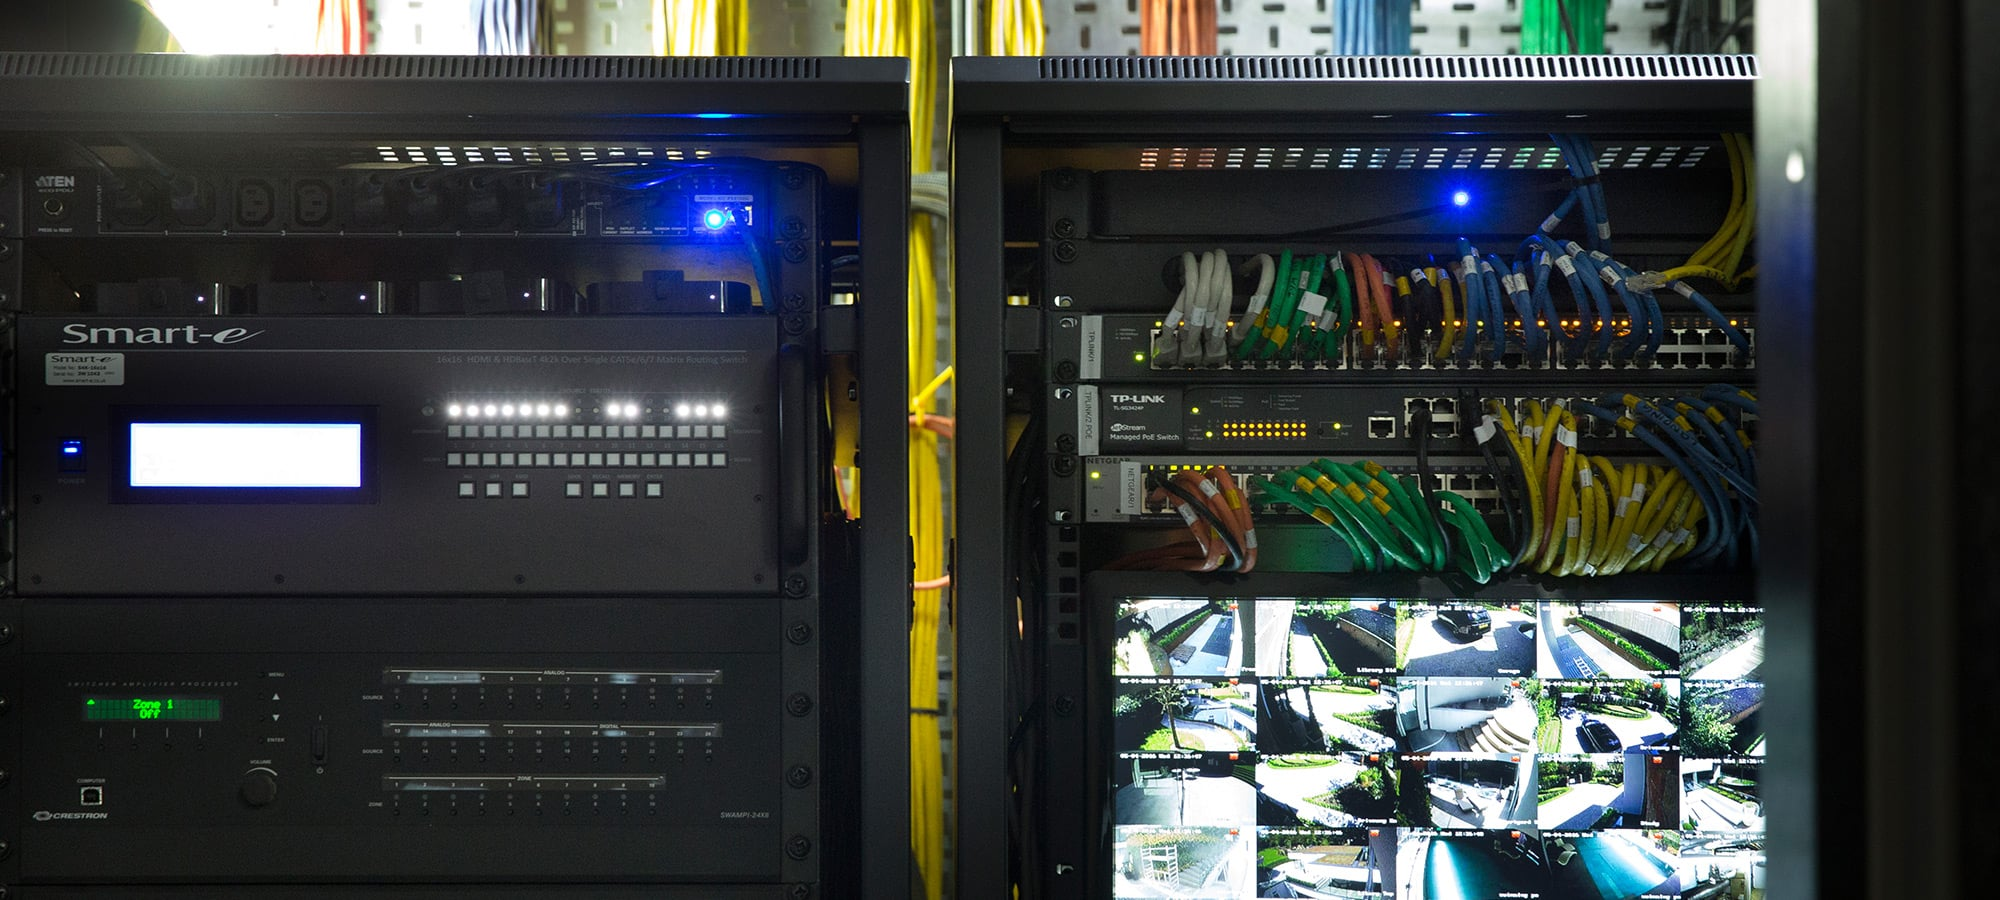 Multi-Room-Video Integrating Multi-Room AV into New Build Homes: Expert Advice From Top London AV Installers